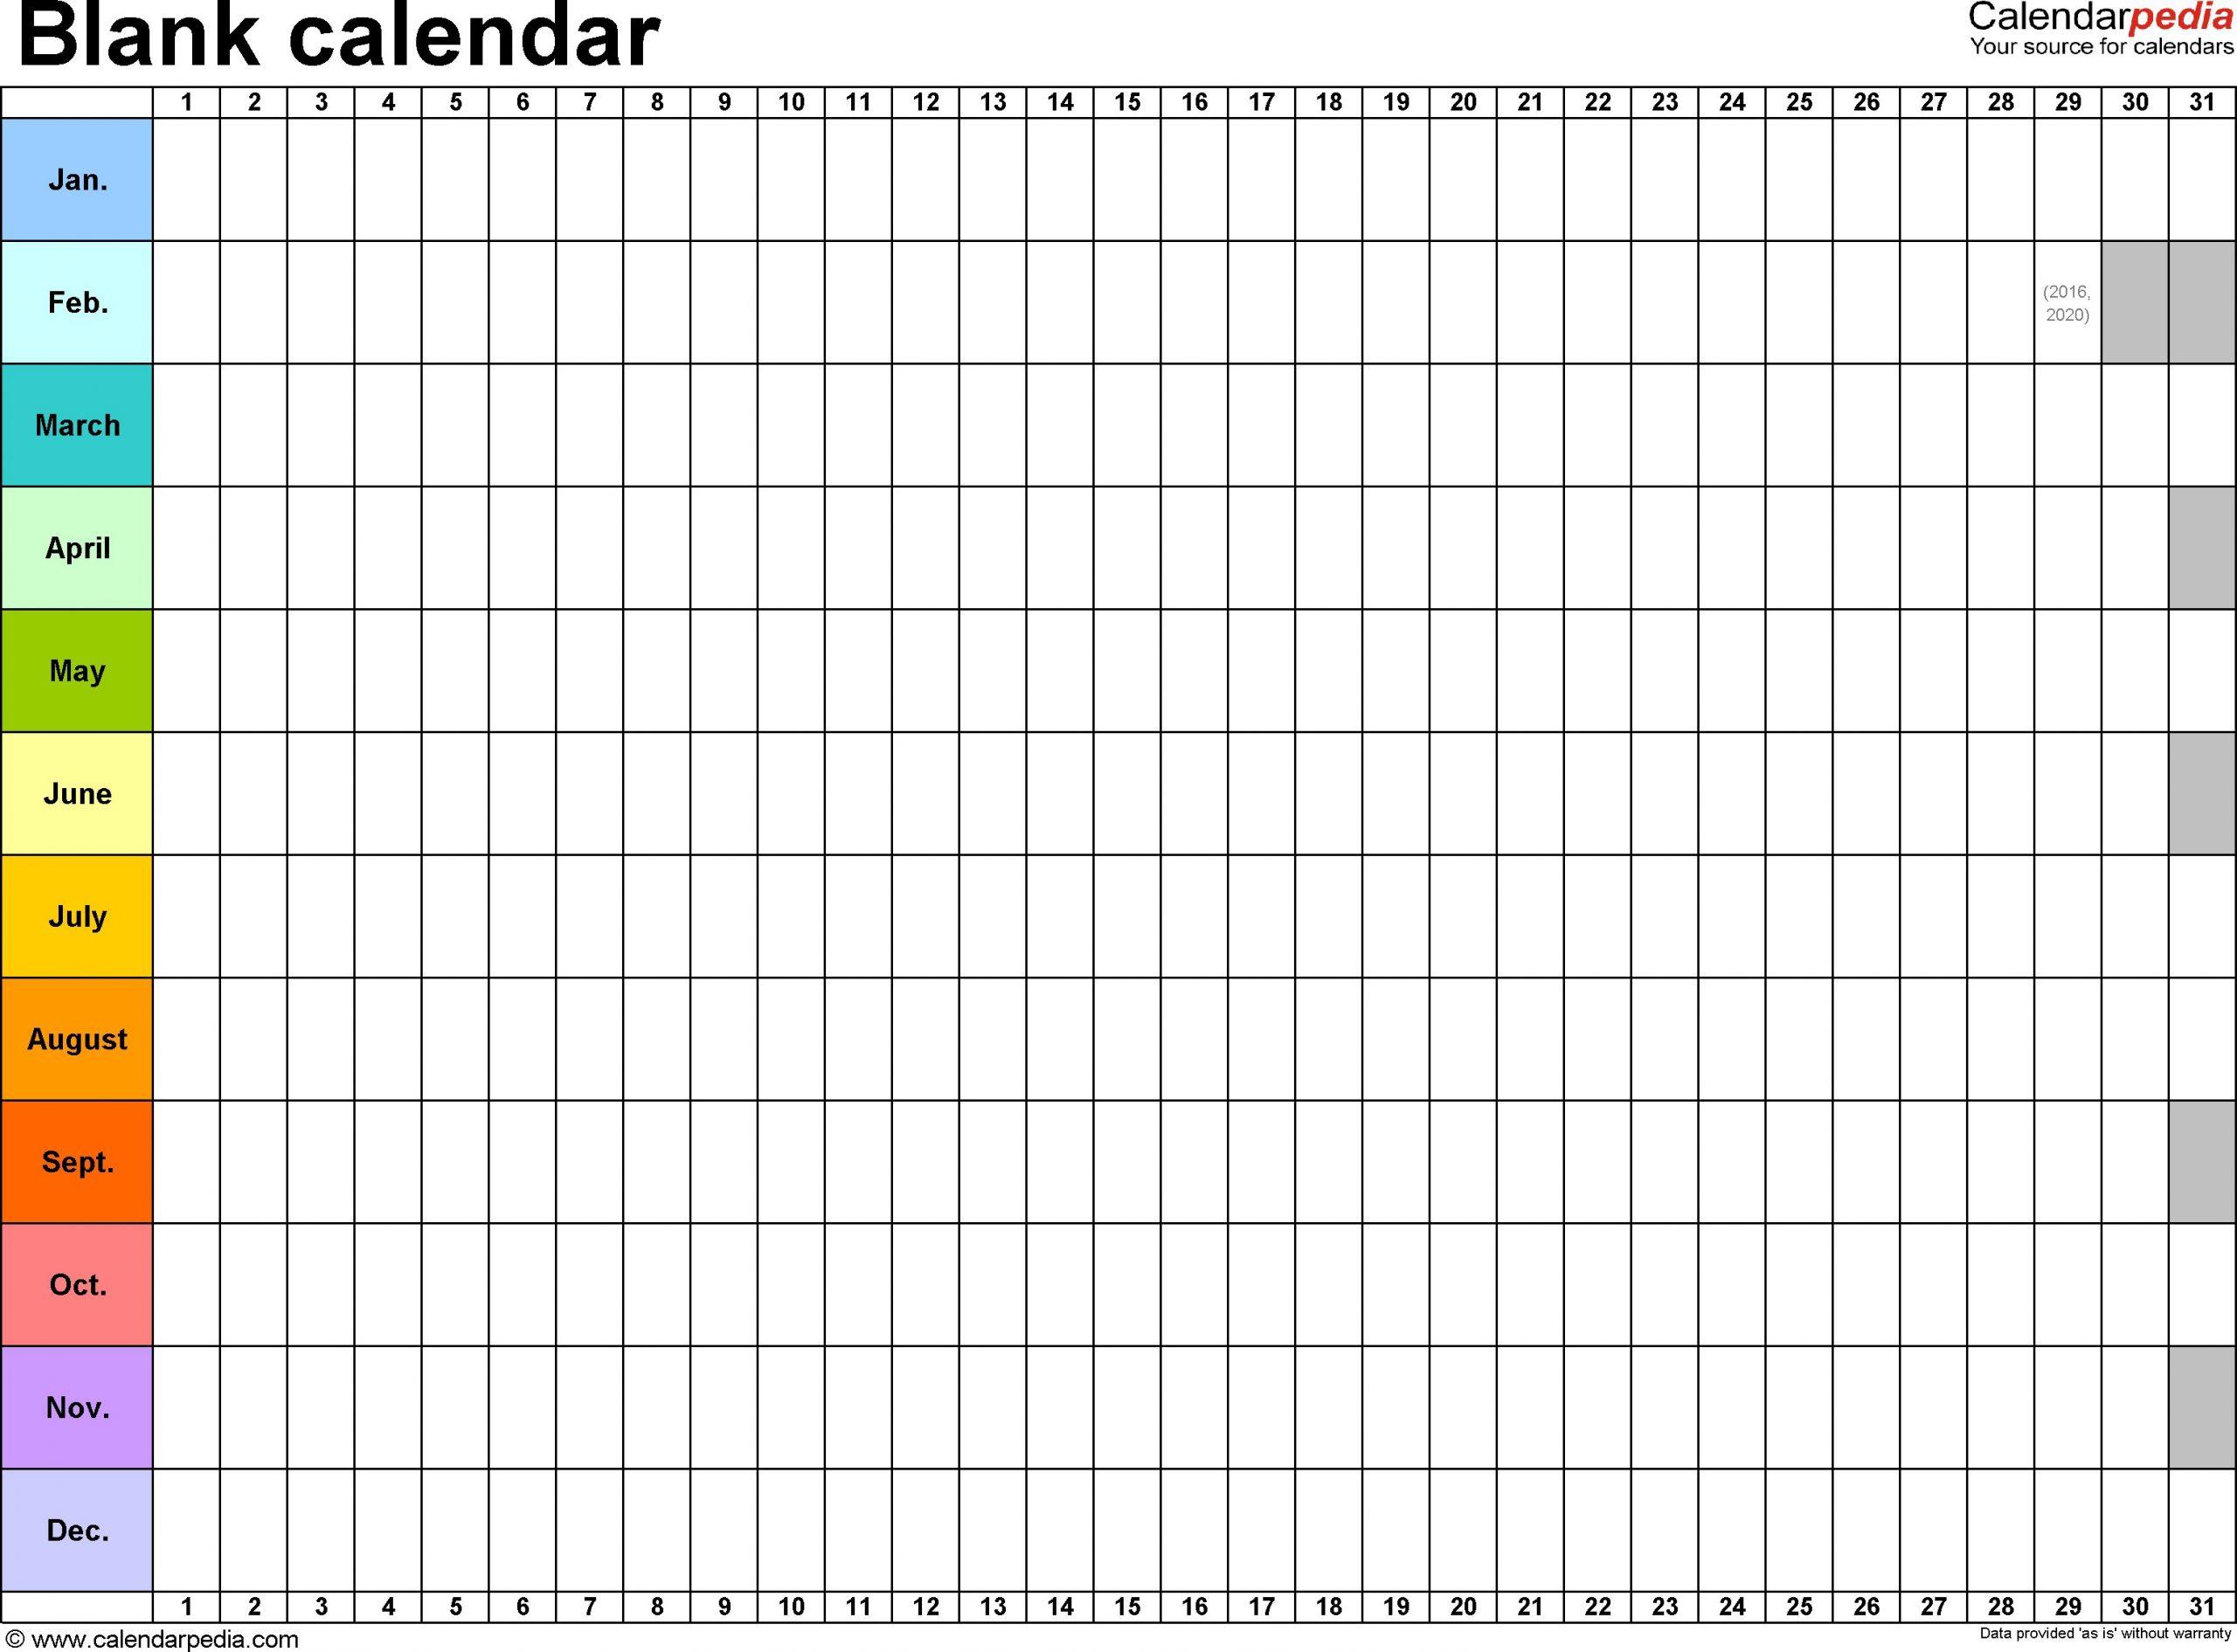 Blank Yearly Calendar Grids On One Sheet   Calendar Free Fill In Calendars